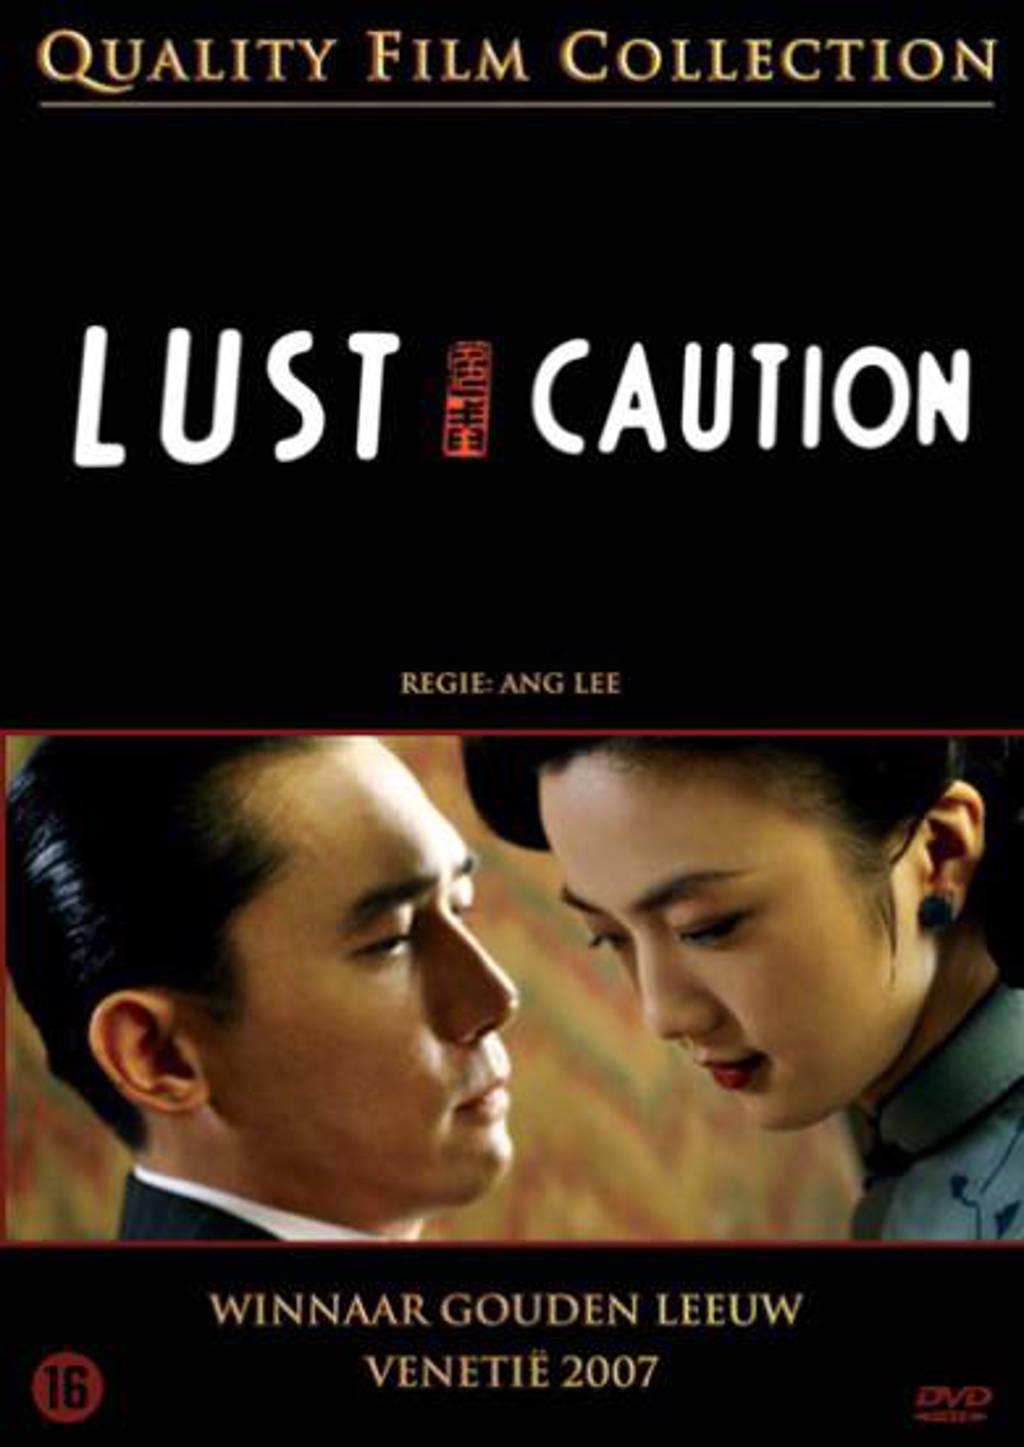 Lust caution (DVD)